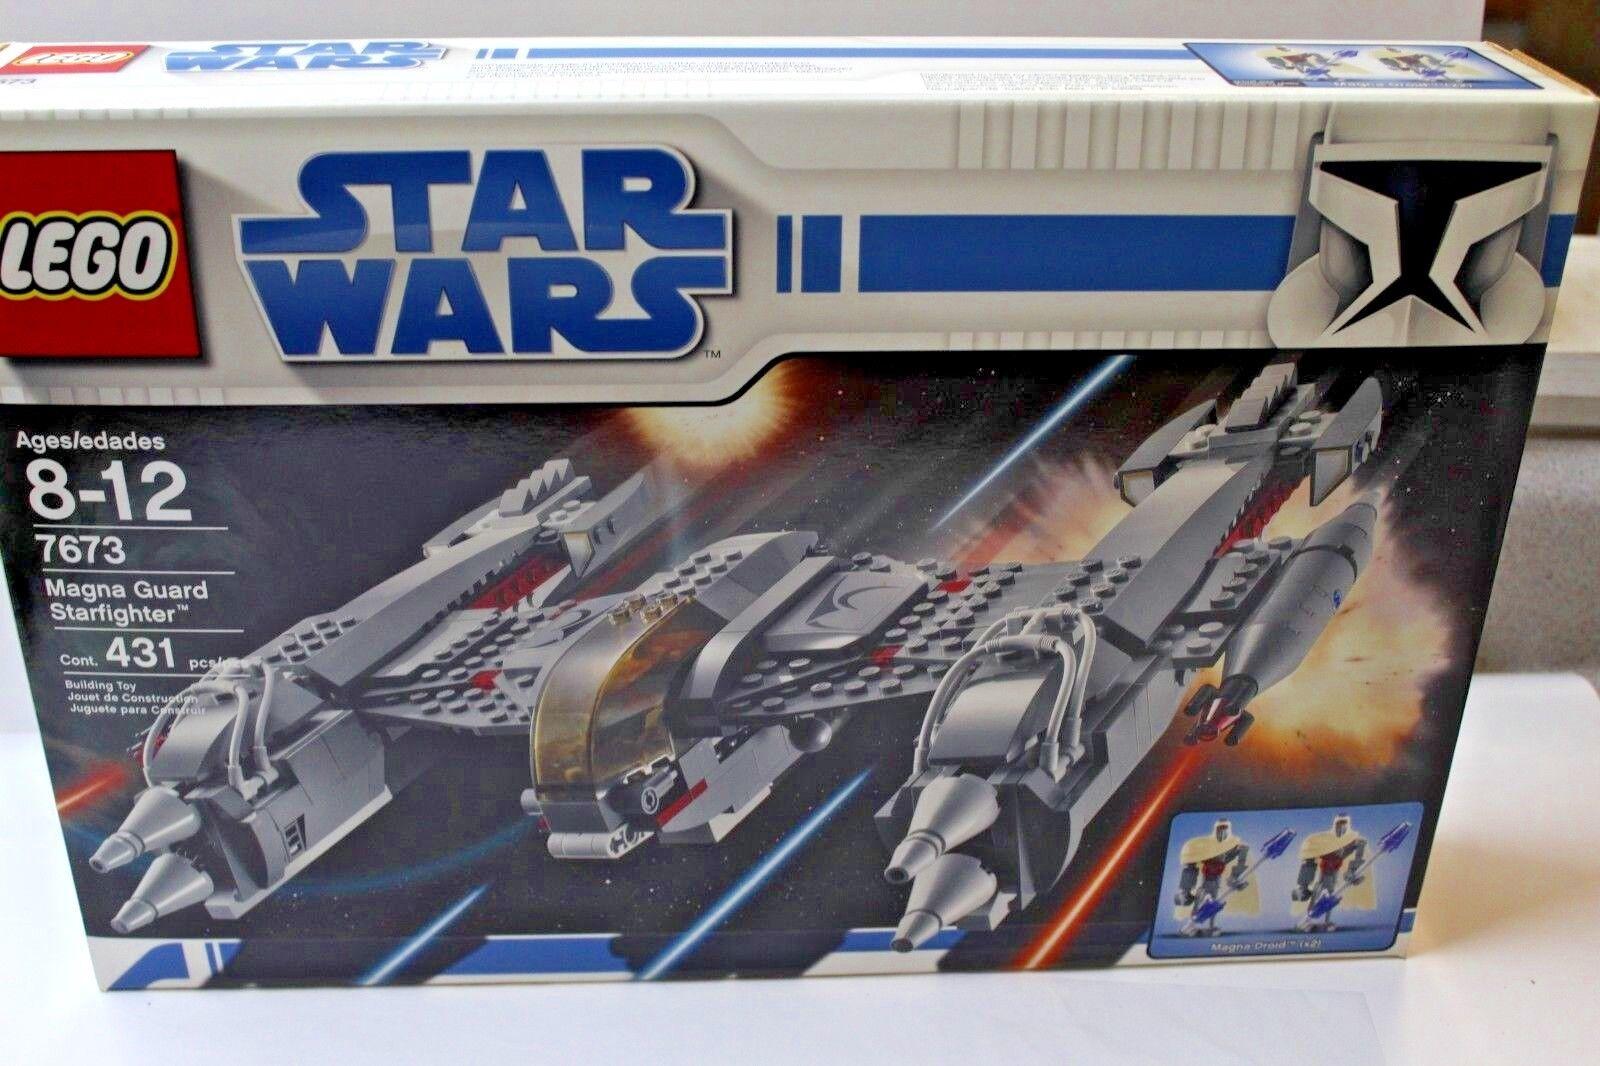 Starfighter7673 Wars Star Lego Lego Magnaguard Star LzMpjqSUVG